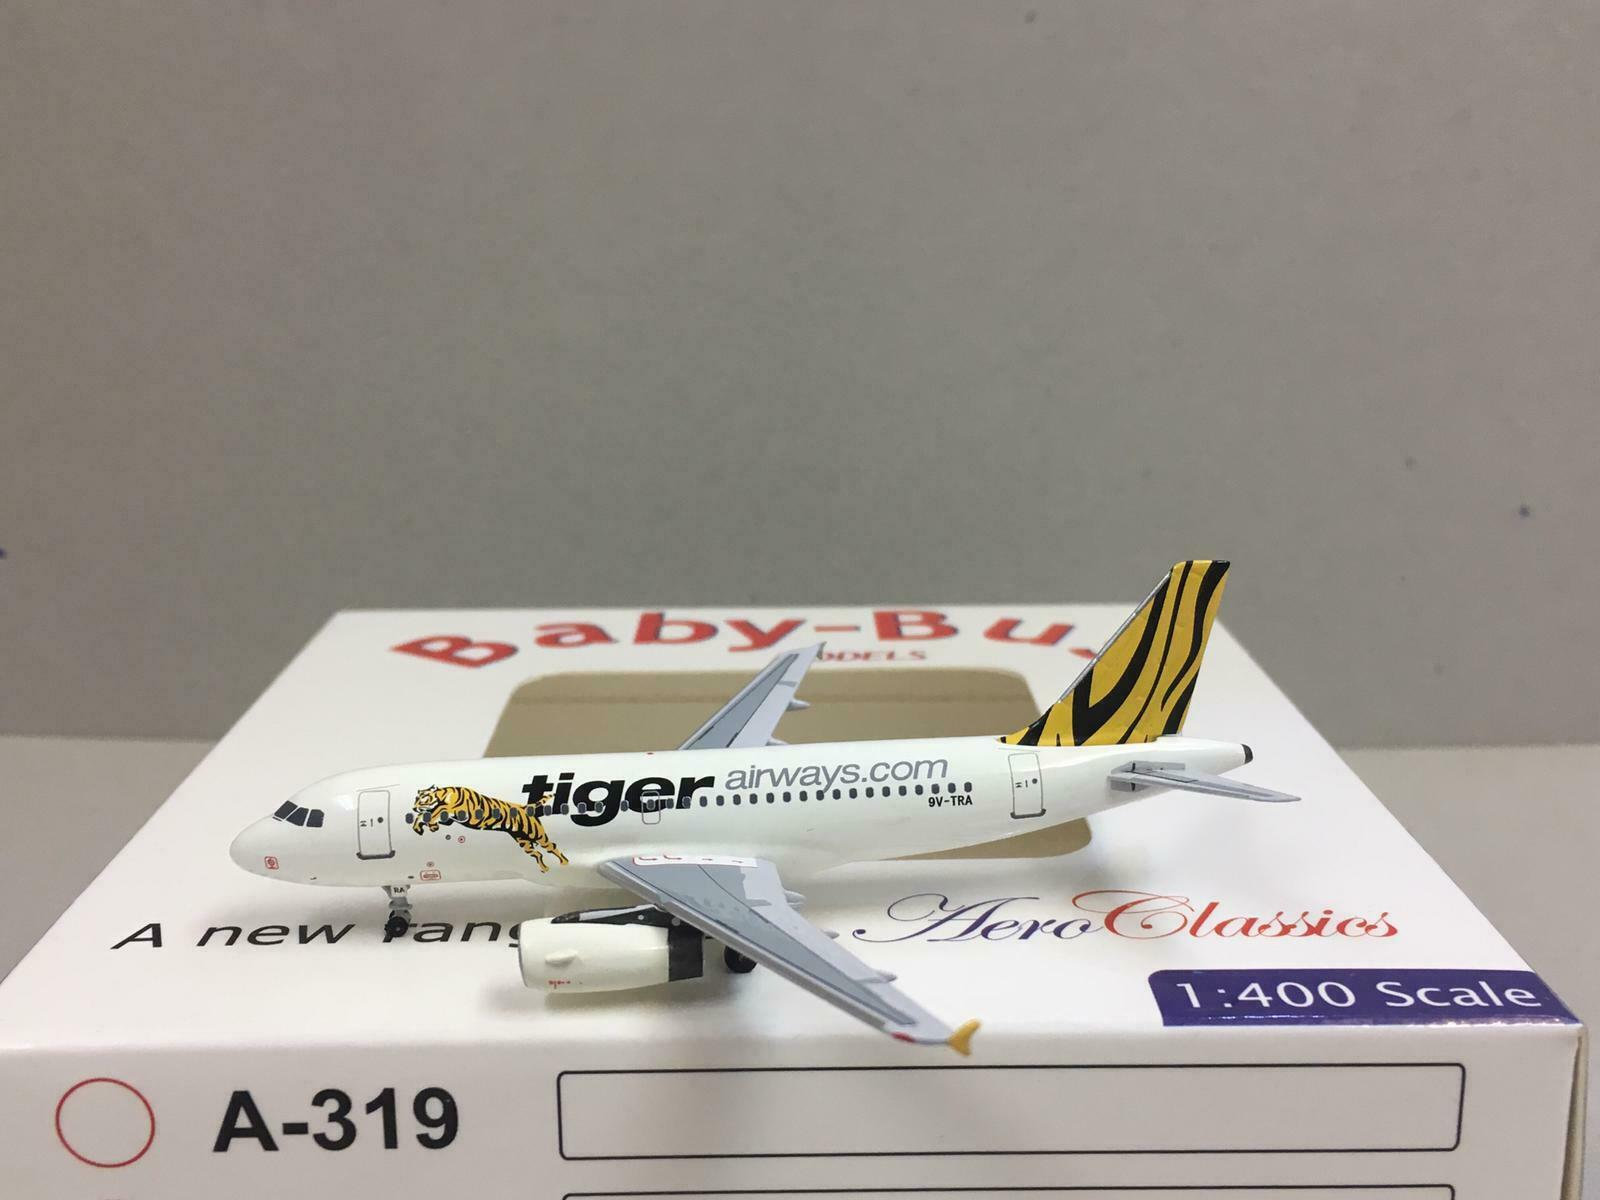 Aeroclassics 1 1 1 400 Tiger Airways AIRBUS A319-100 9V-TRA b55dba